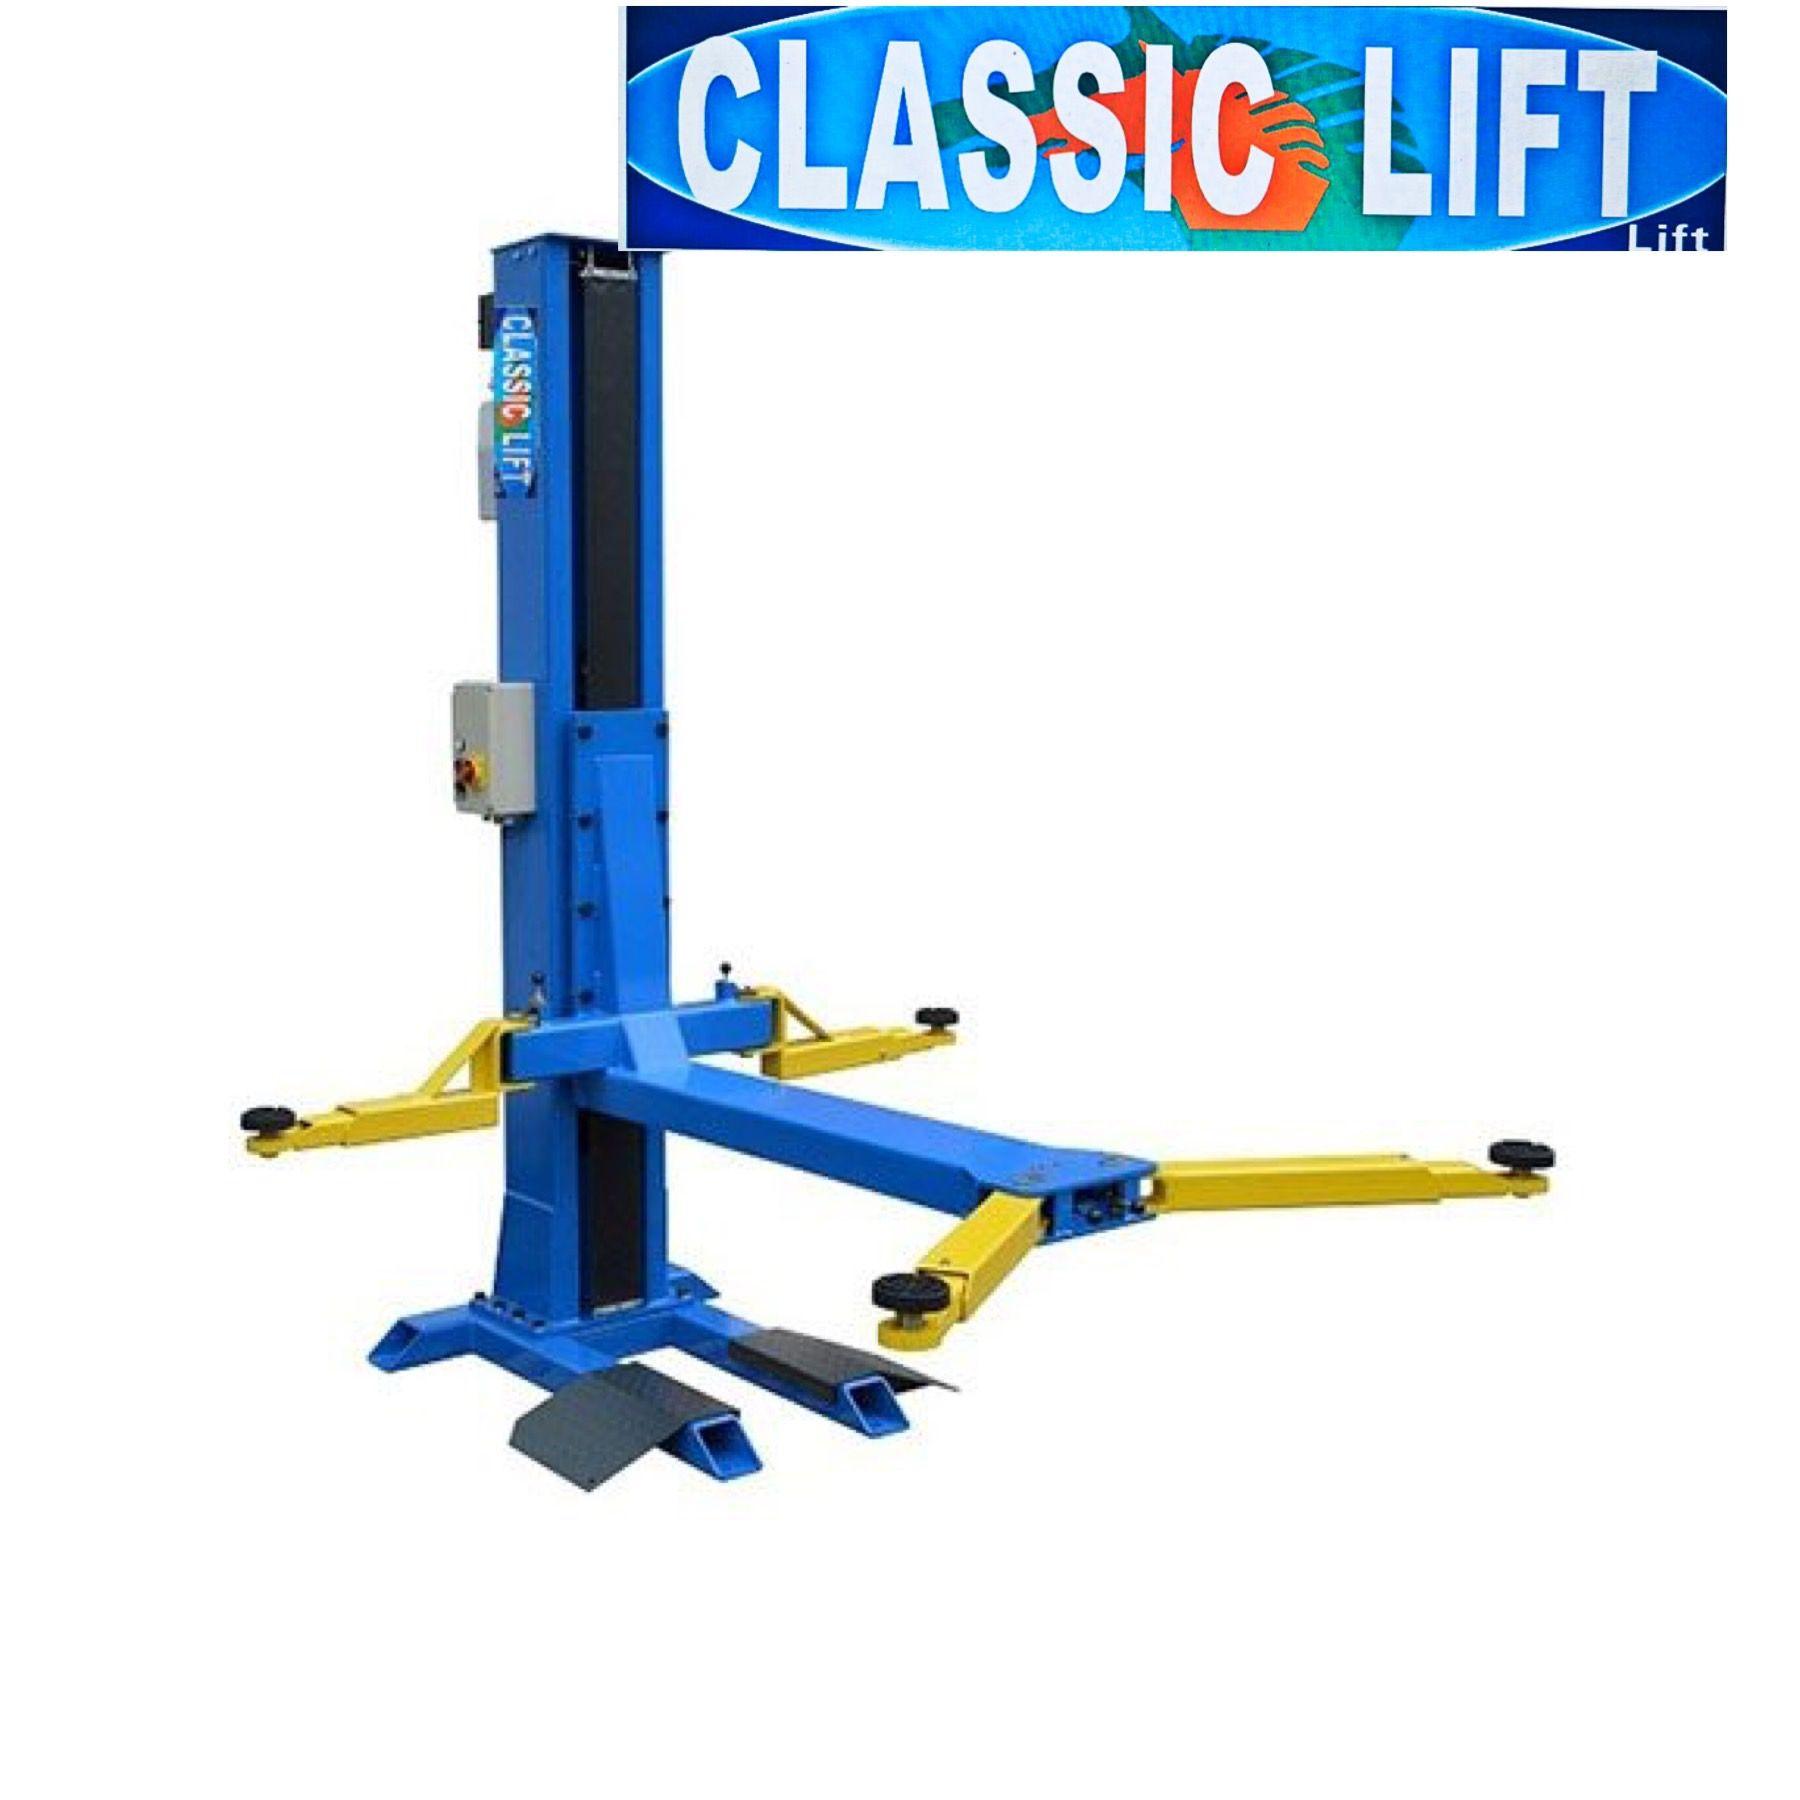 lassic Lift Australia carries both a single post car lift